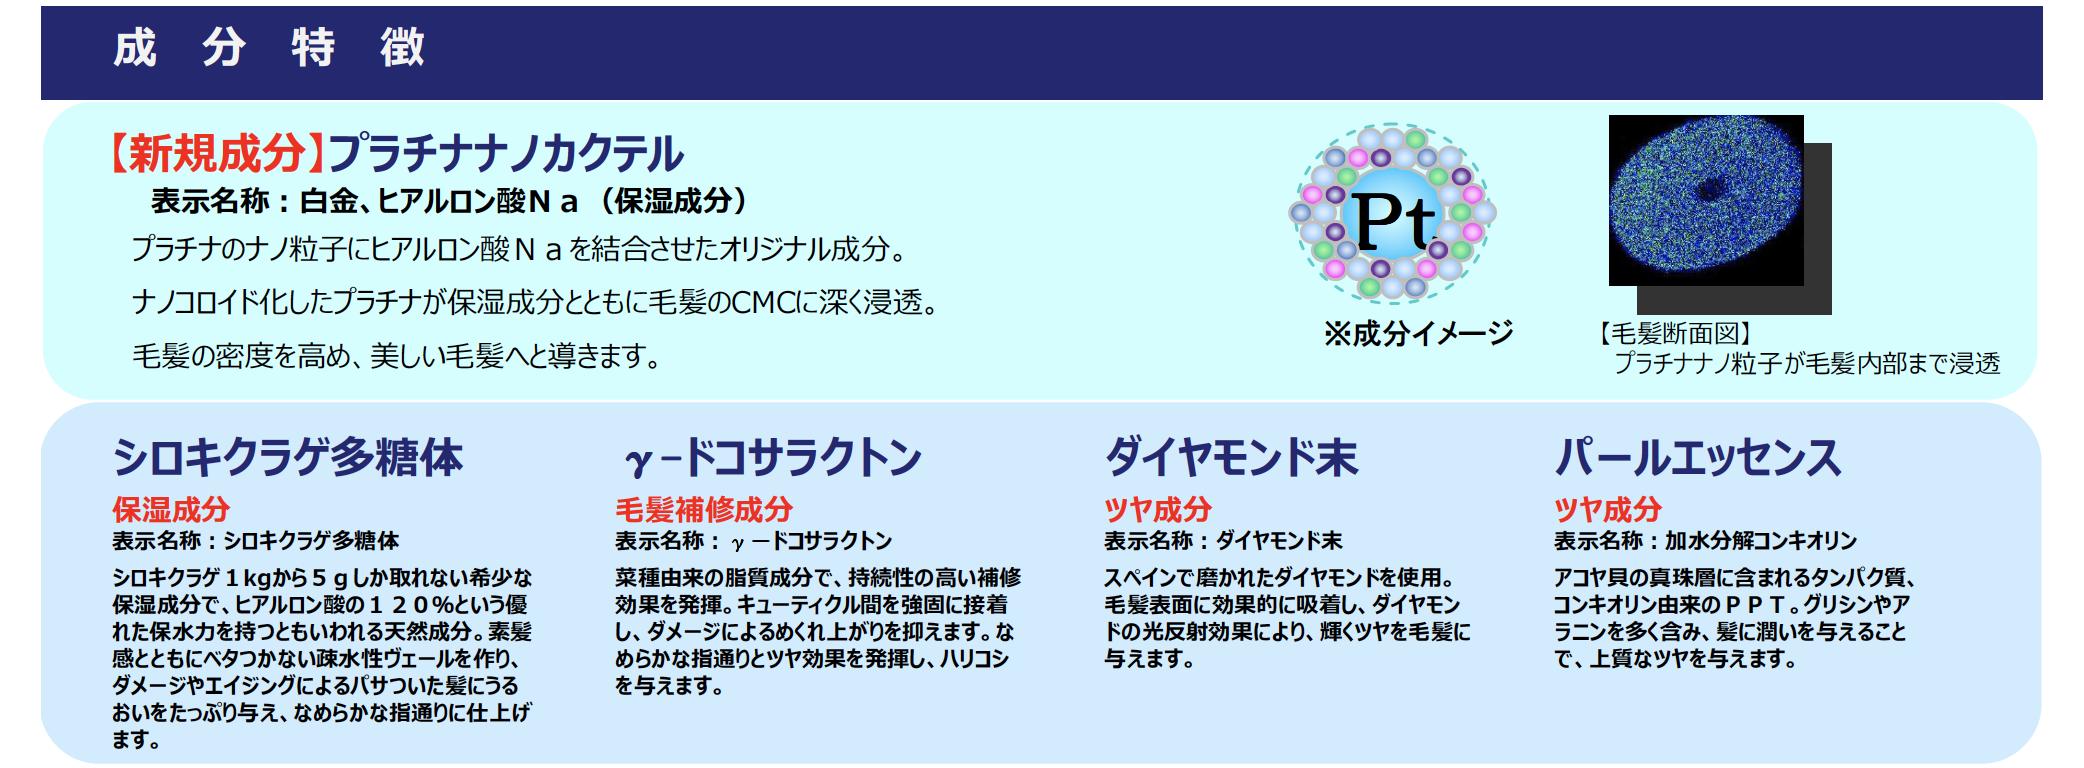 WJ ウォータージュエル 2020シリーズ 詳細02